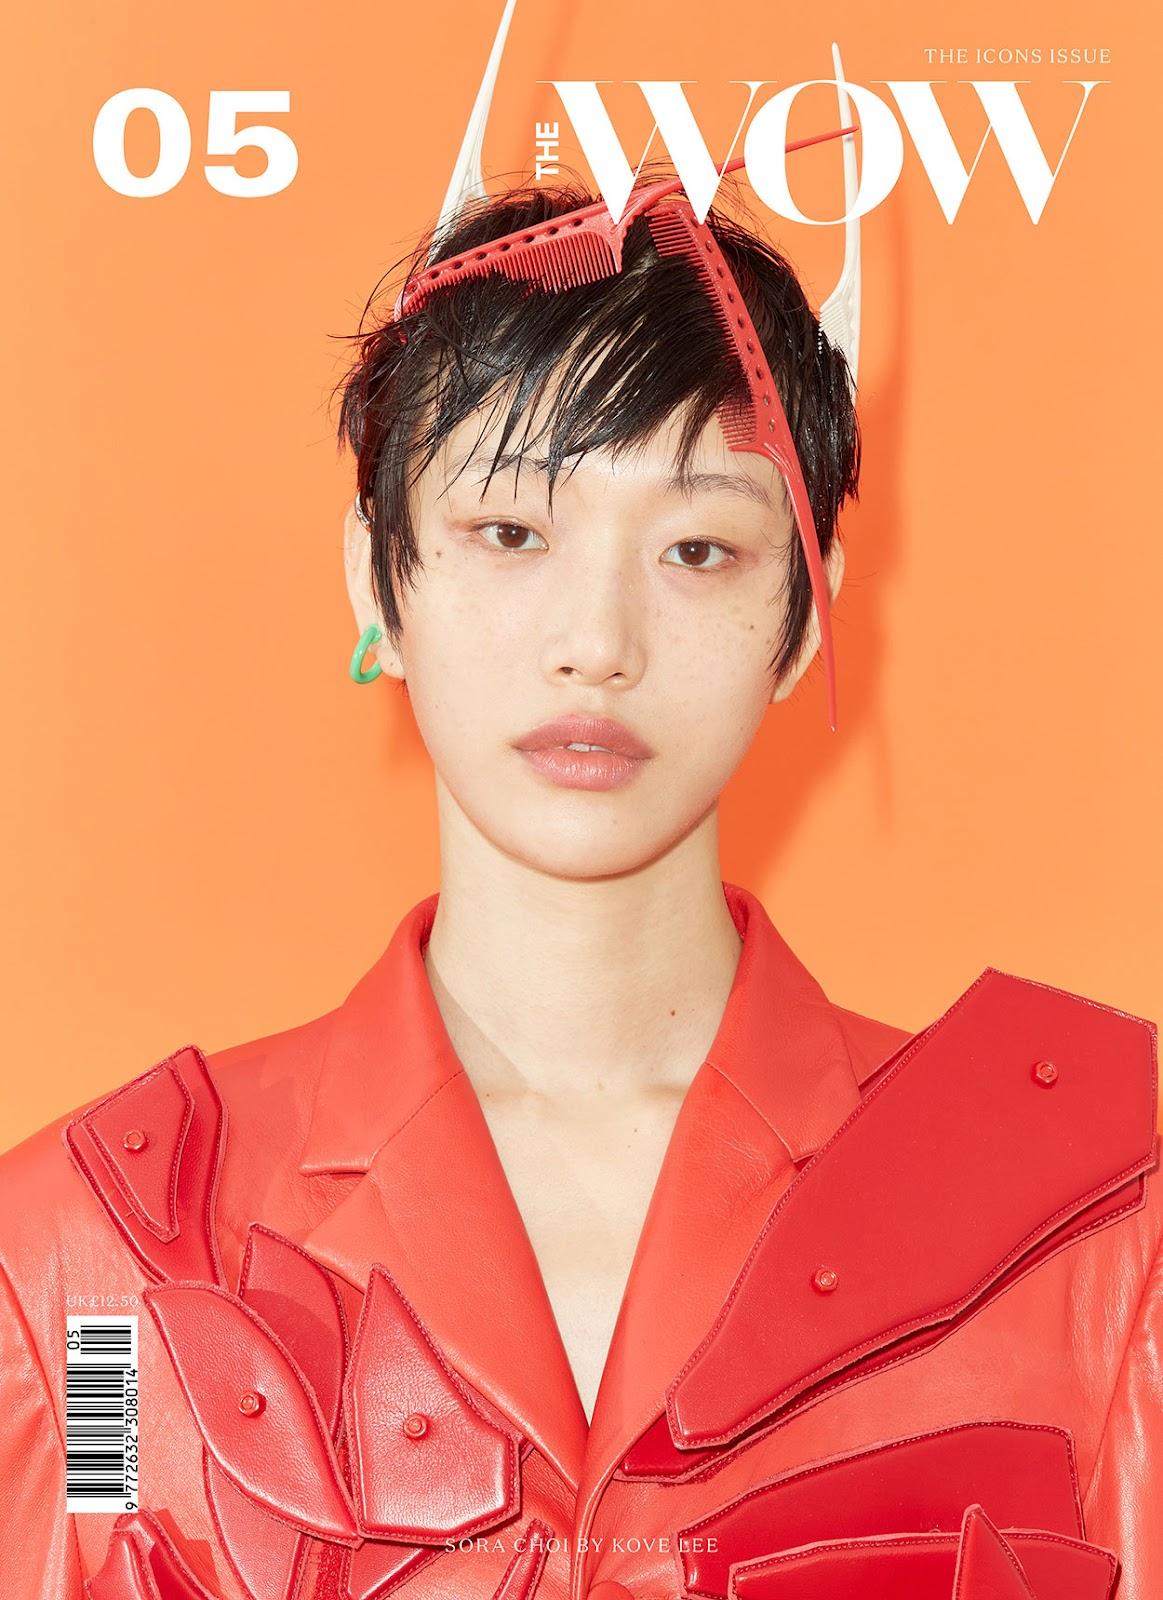 SMILE: Sora Choi in The WOW Magazine #5 2021 bt Kove Lee